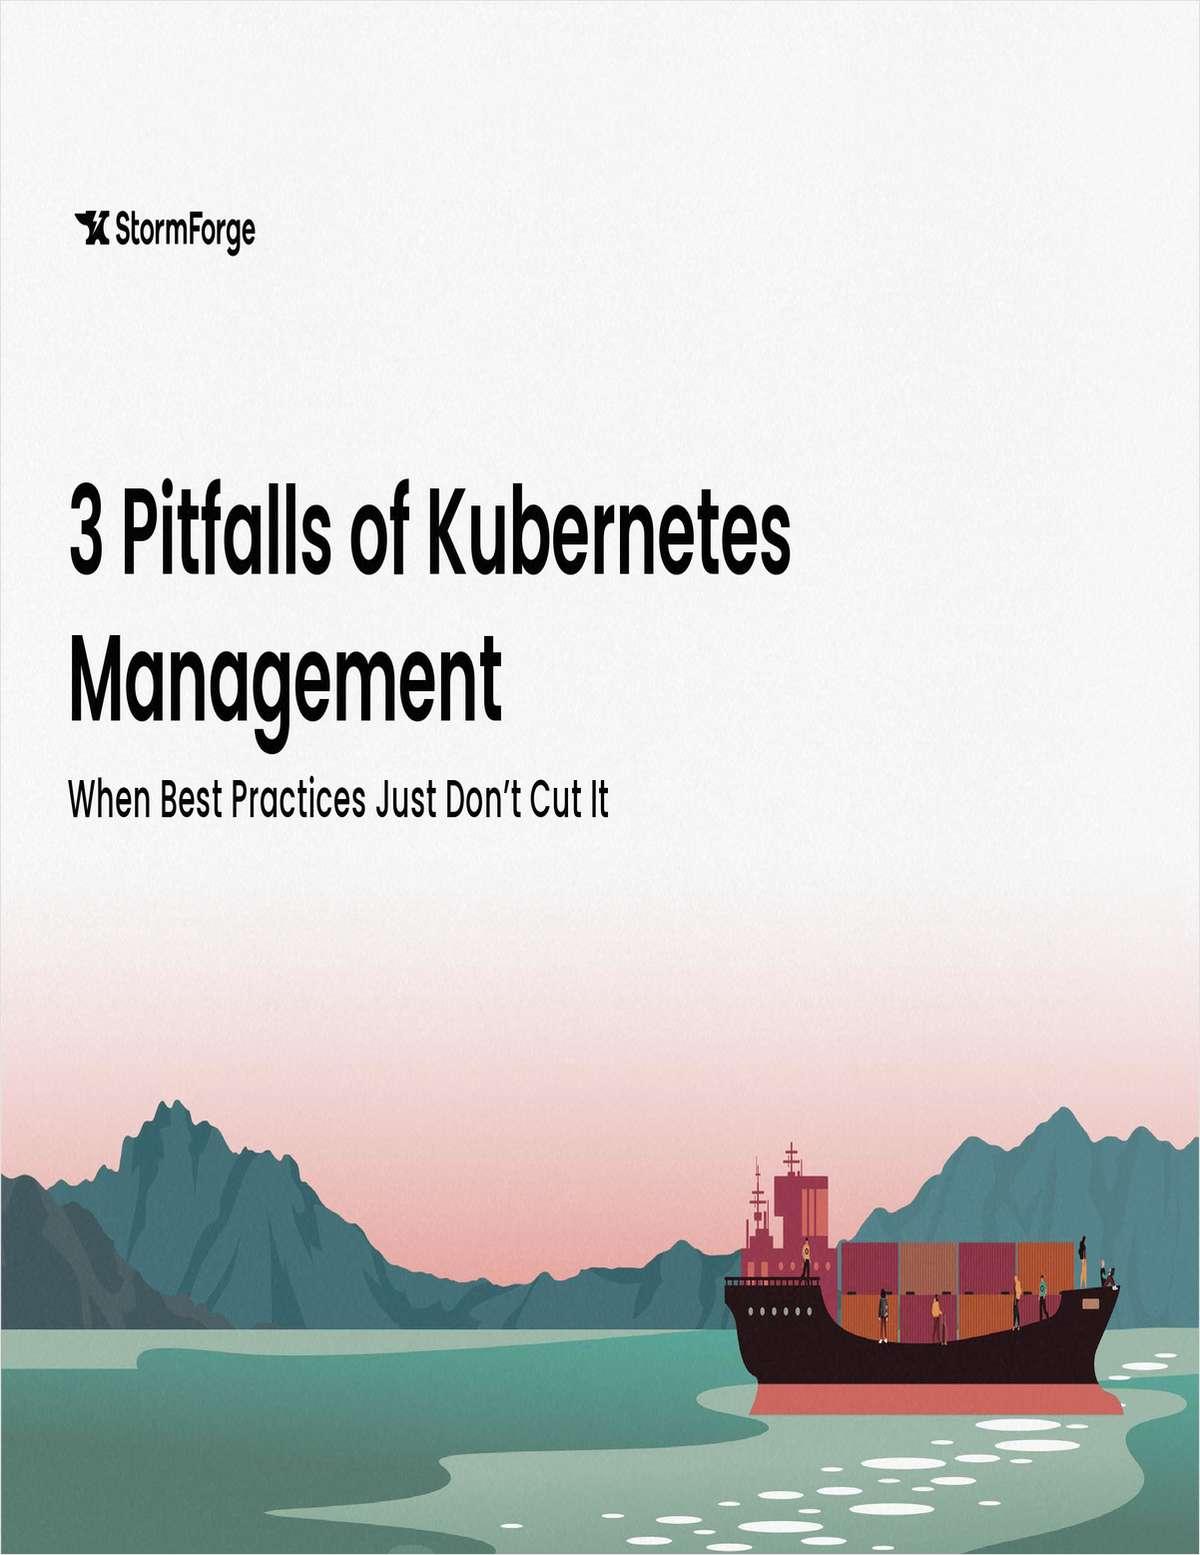 3 Pitfalls of Kubernetes Management: When Best Practices Just Don't Cut It